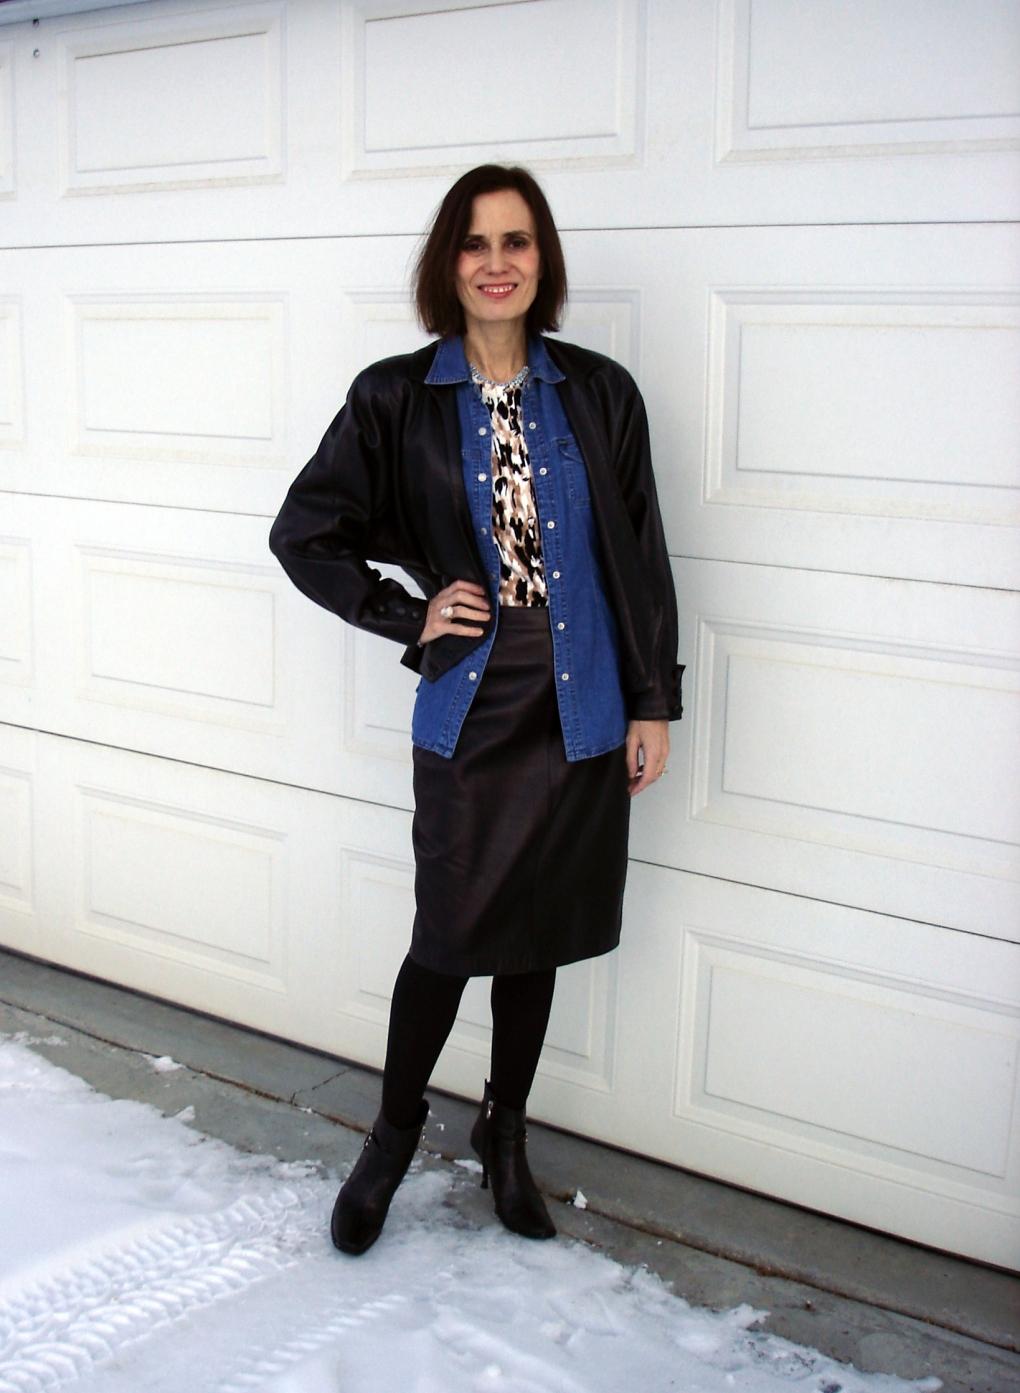 #fashionover40 woman in denim shirt